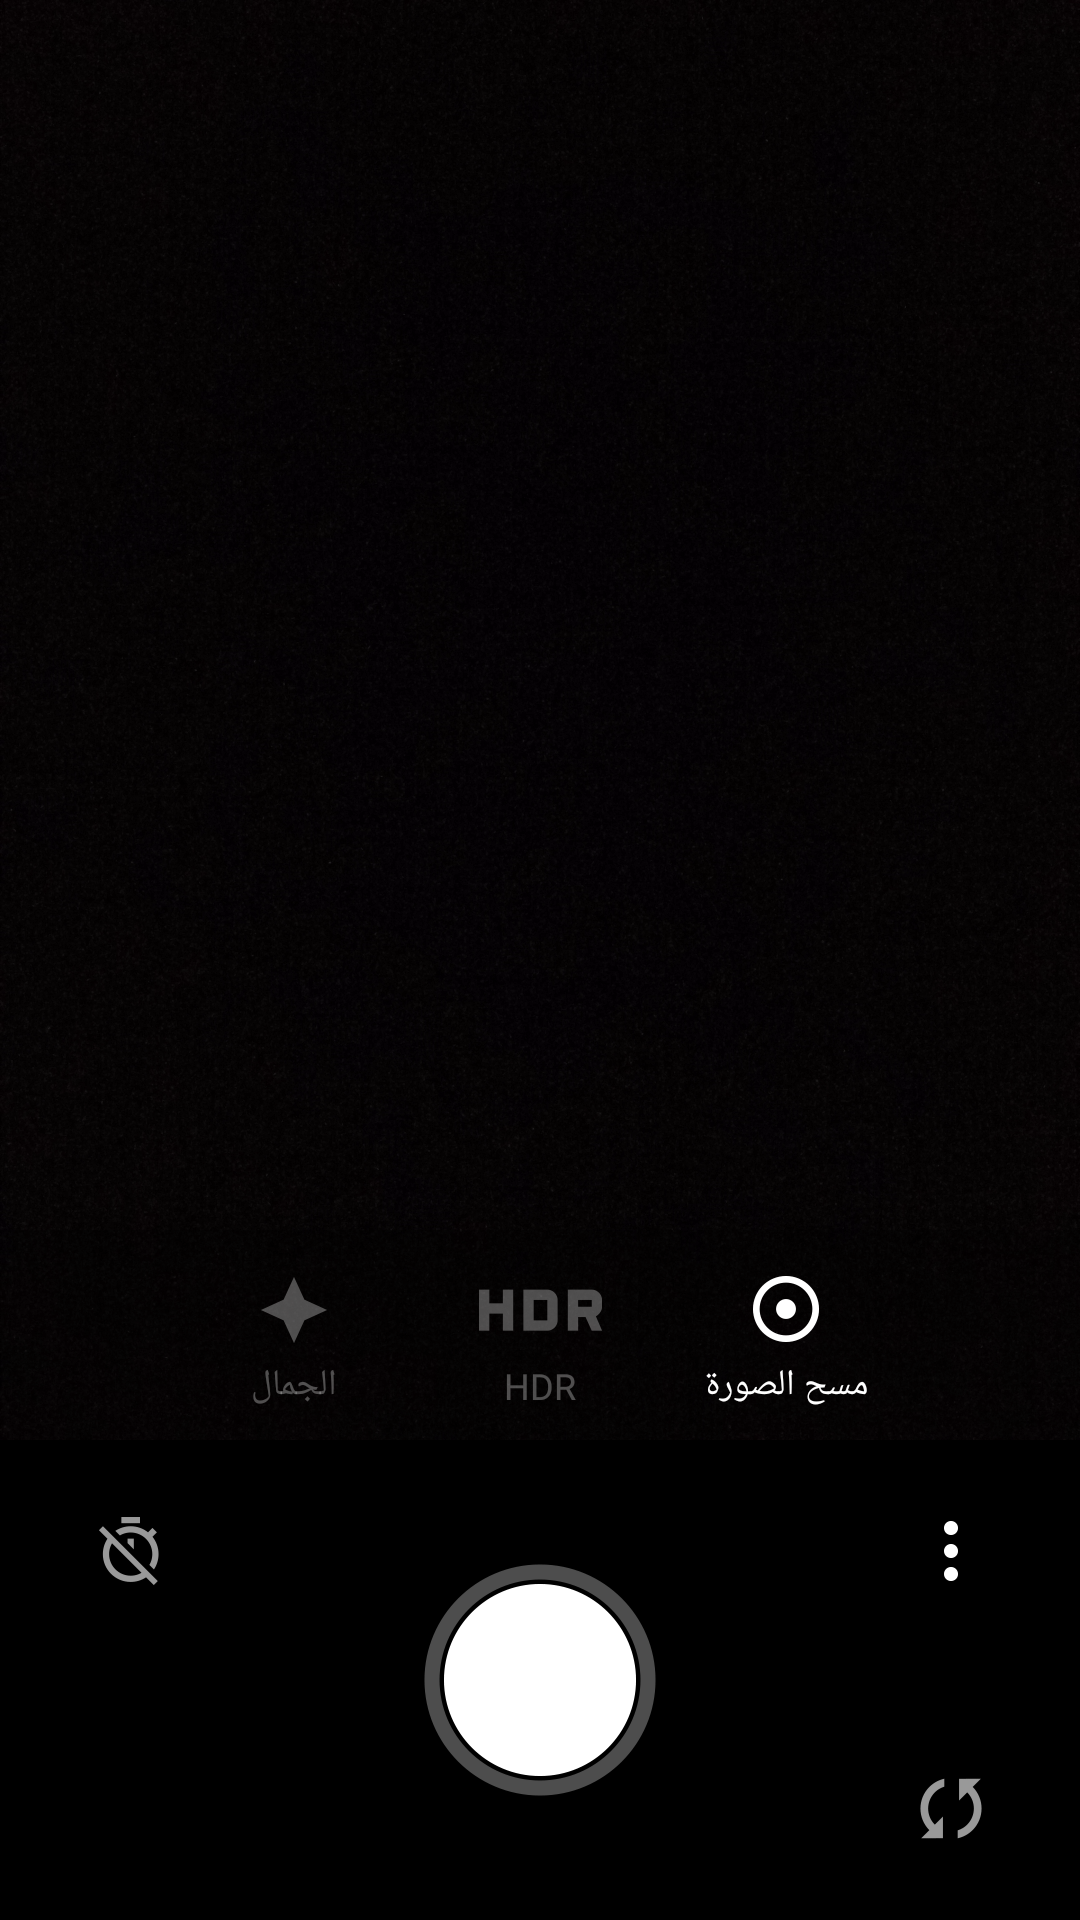 Screenshot_٢٠١٥-١١-٢٠-٢٢-٢٧-٠٧